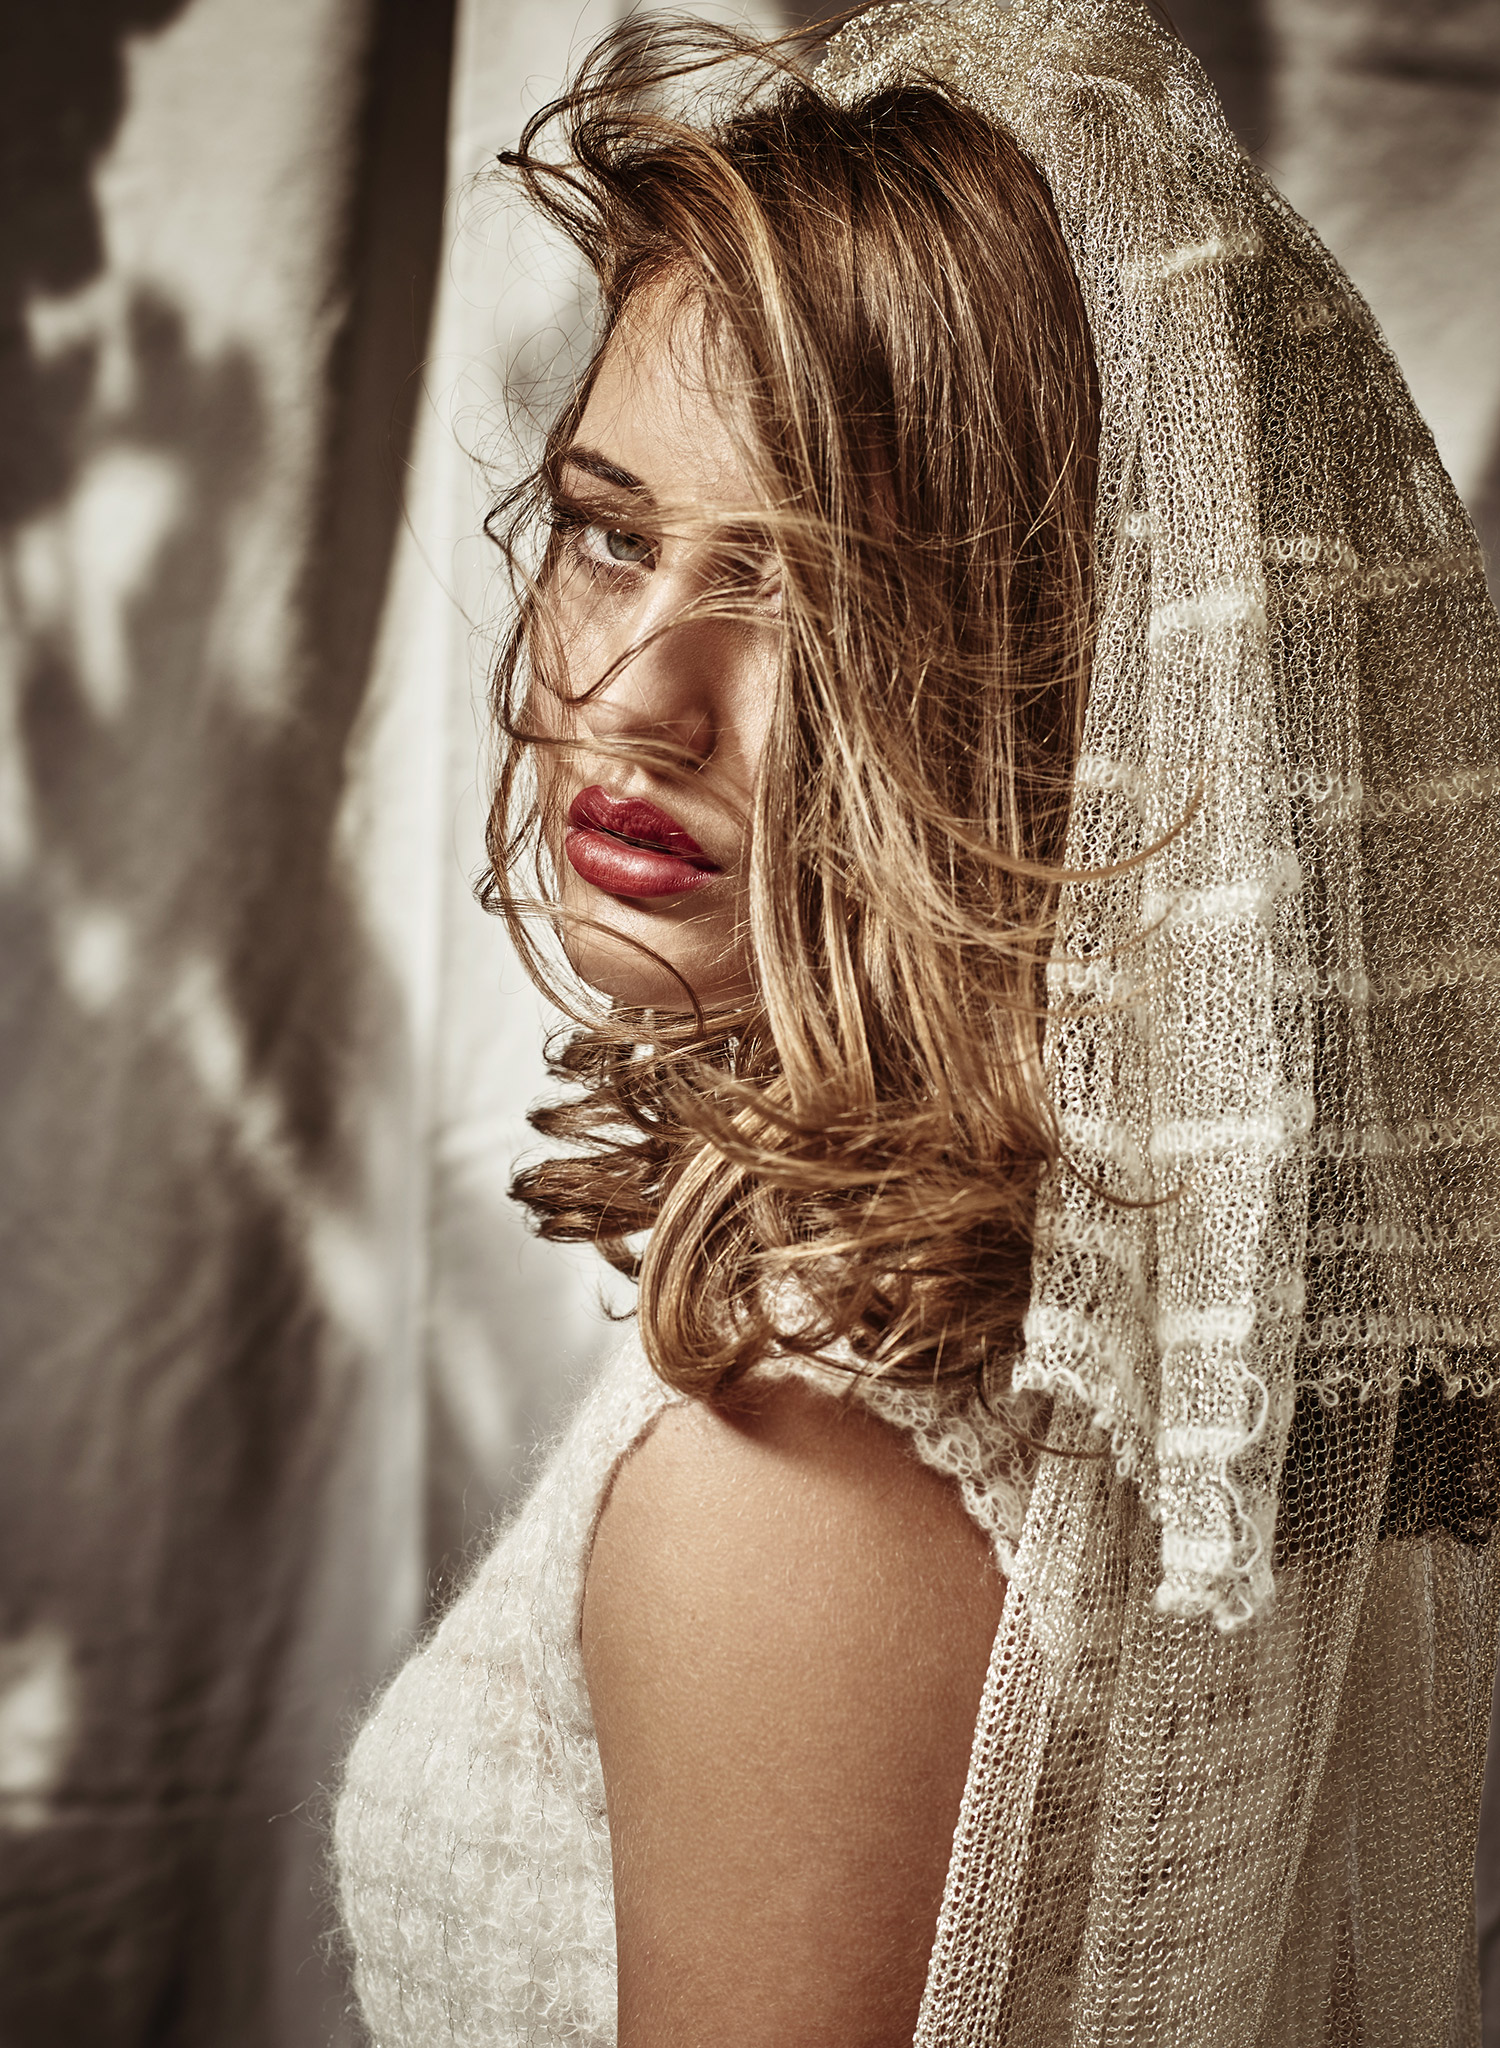 Astrid Obert Photography presents pureknit by werner hafenbradl